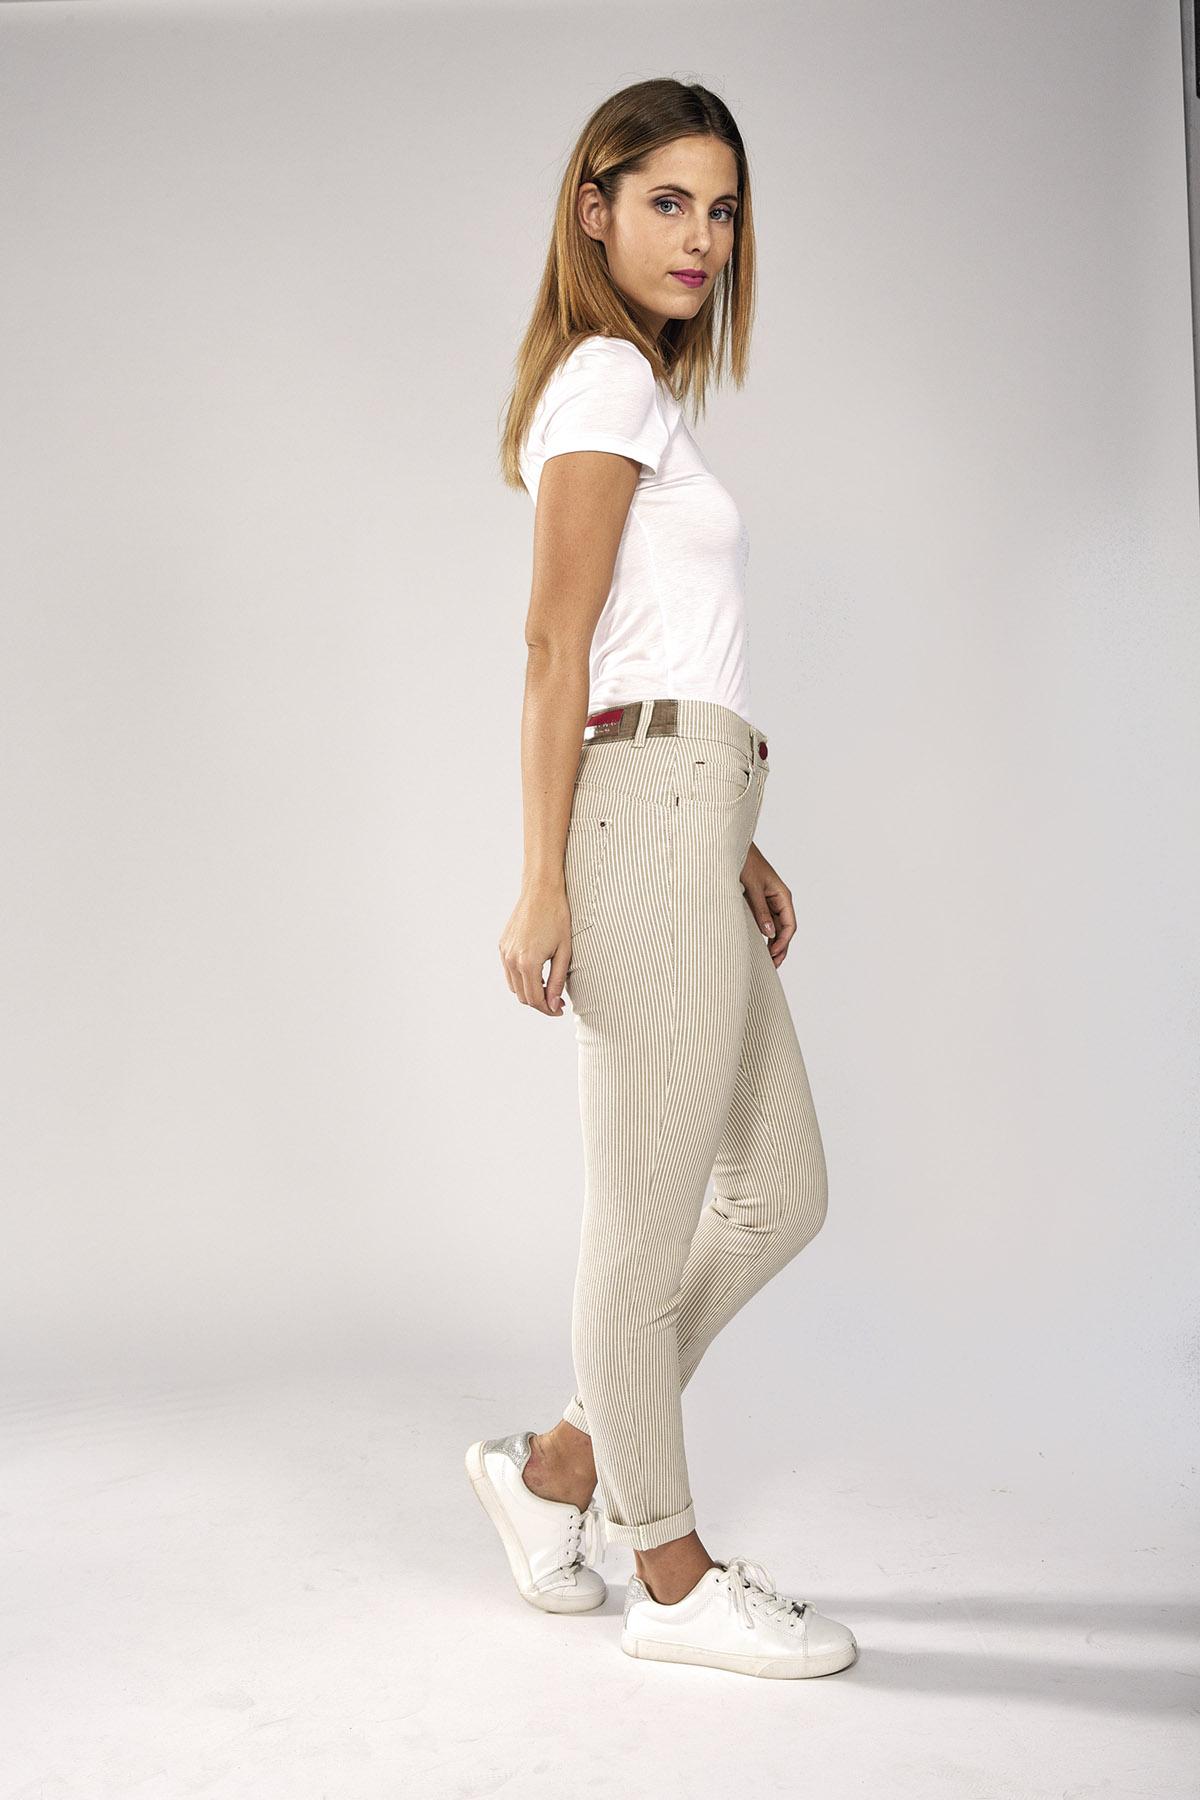 Pantalone jeans donna Iber modello Luisa